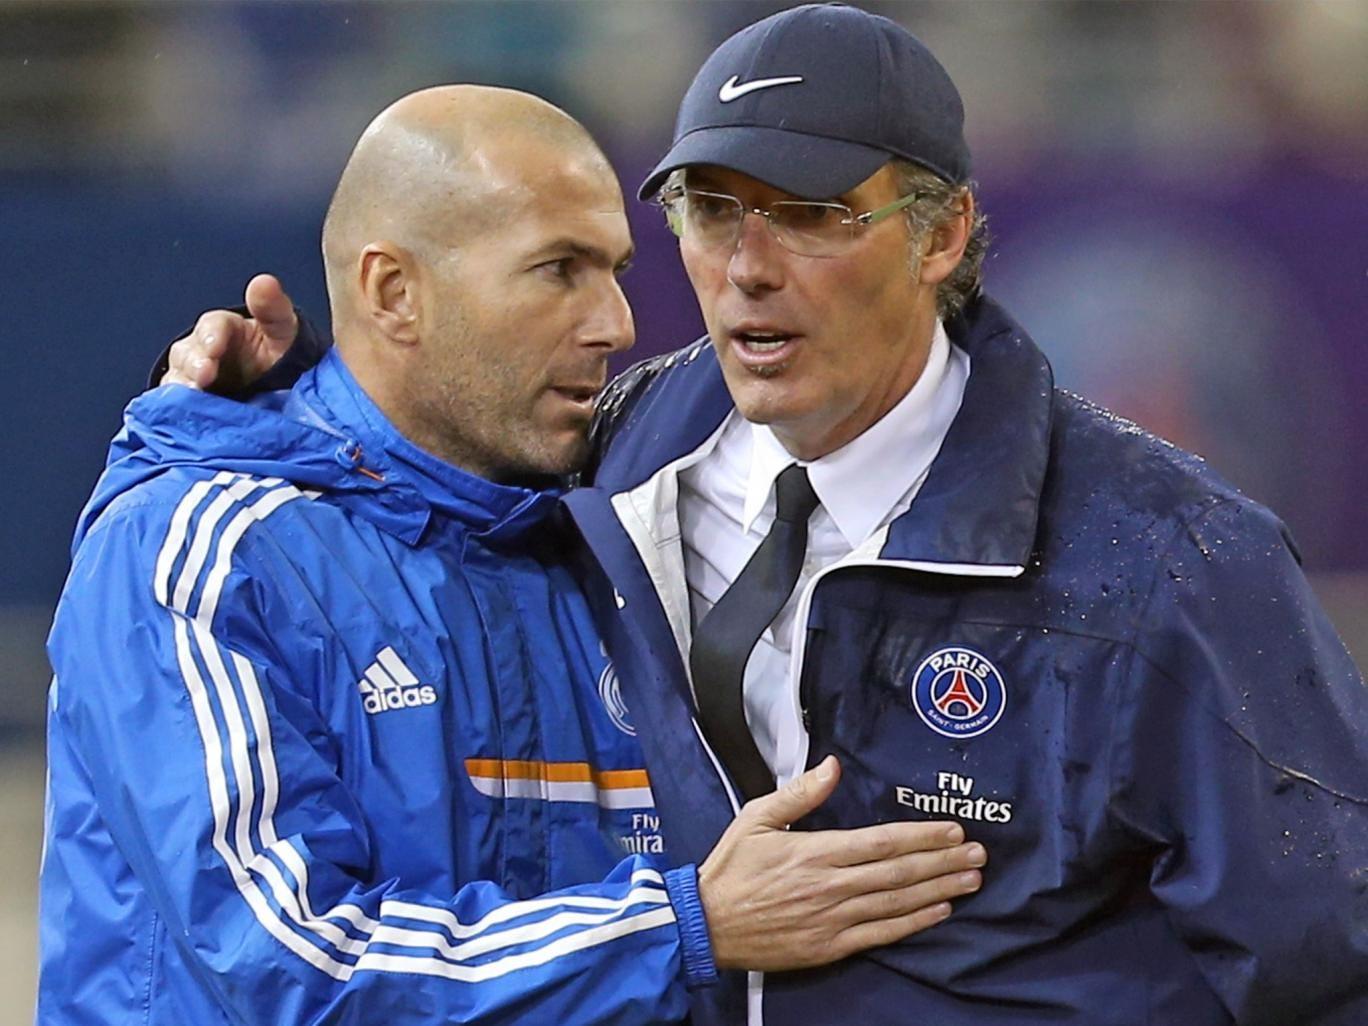 Real Madrid's sporting director Zinedine Zidane (left) held the fort when Jose Mourinho left